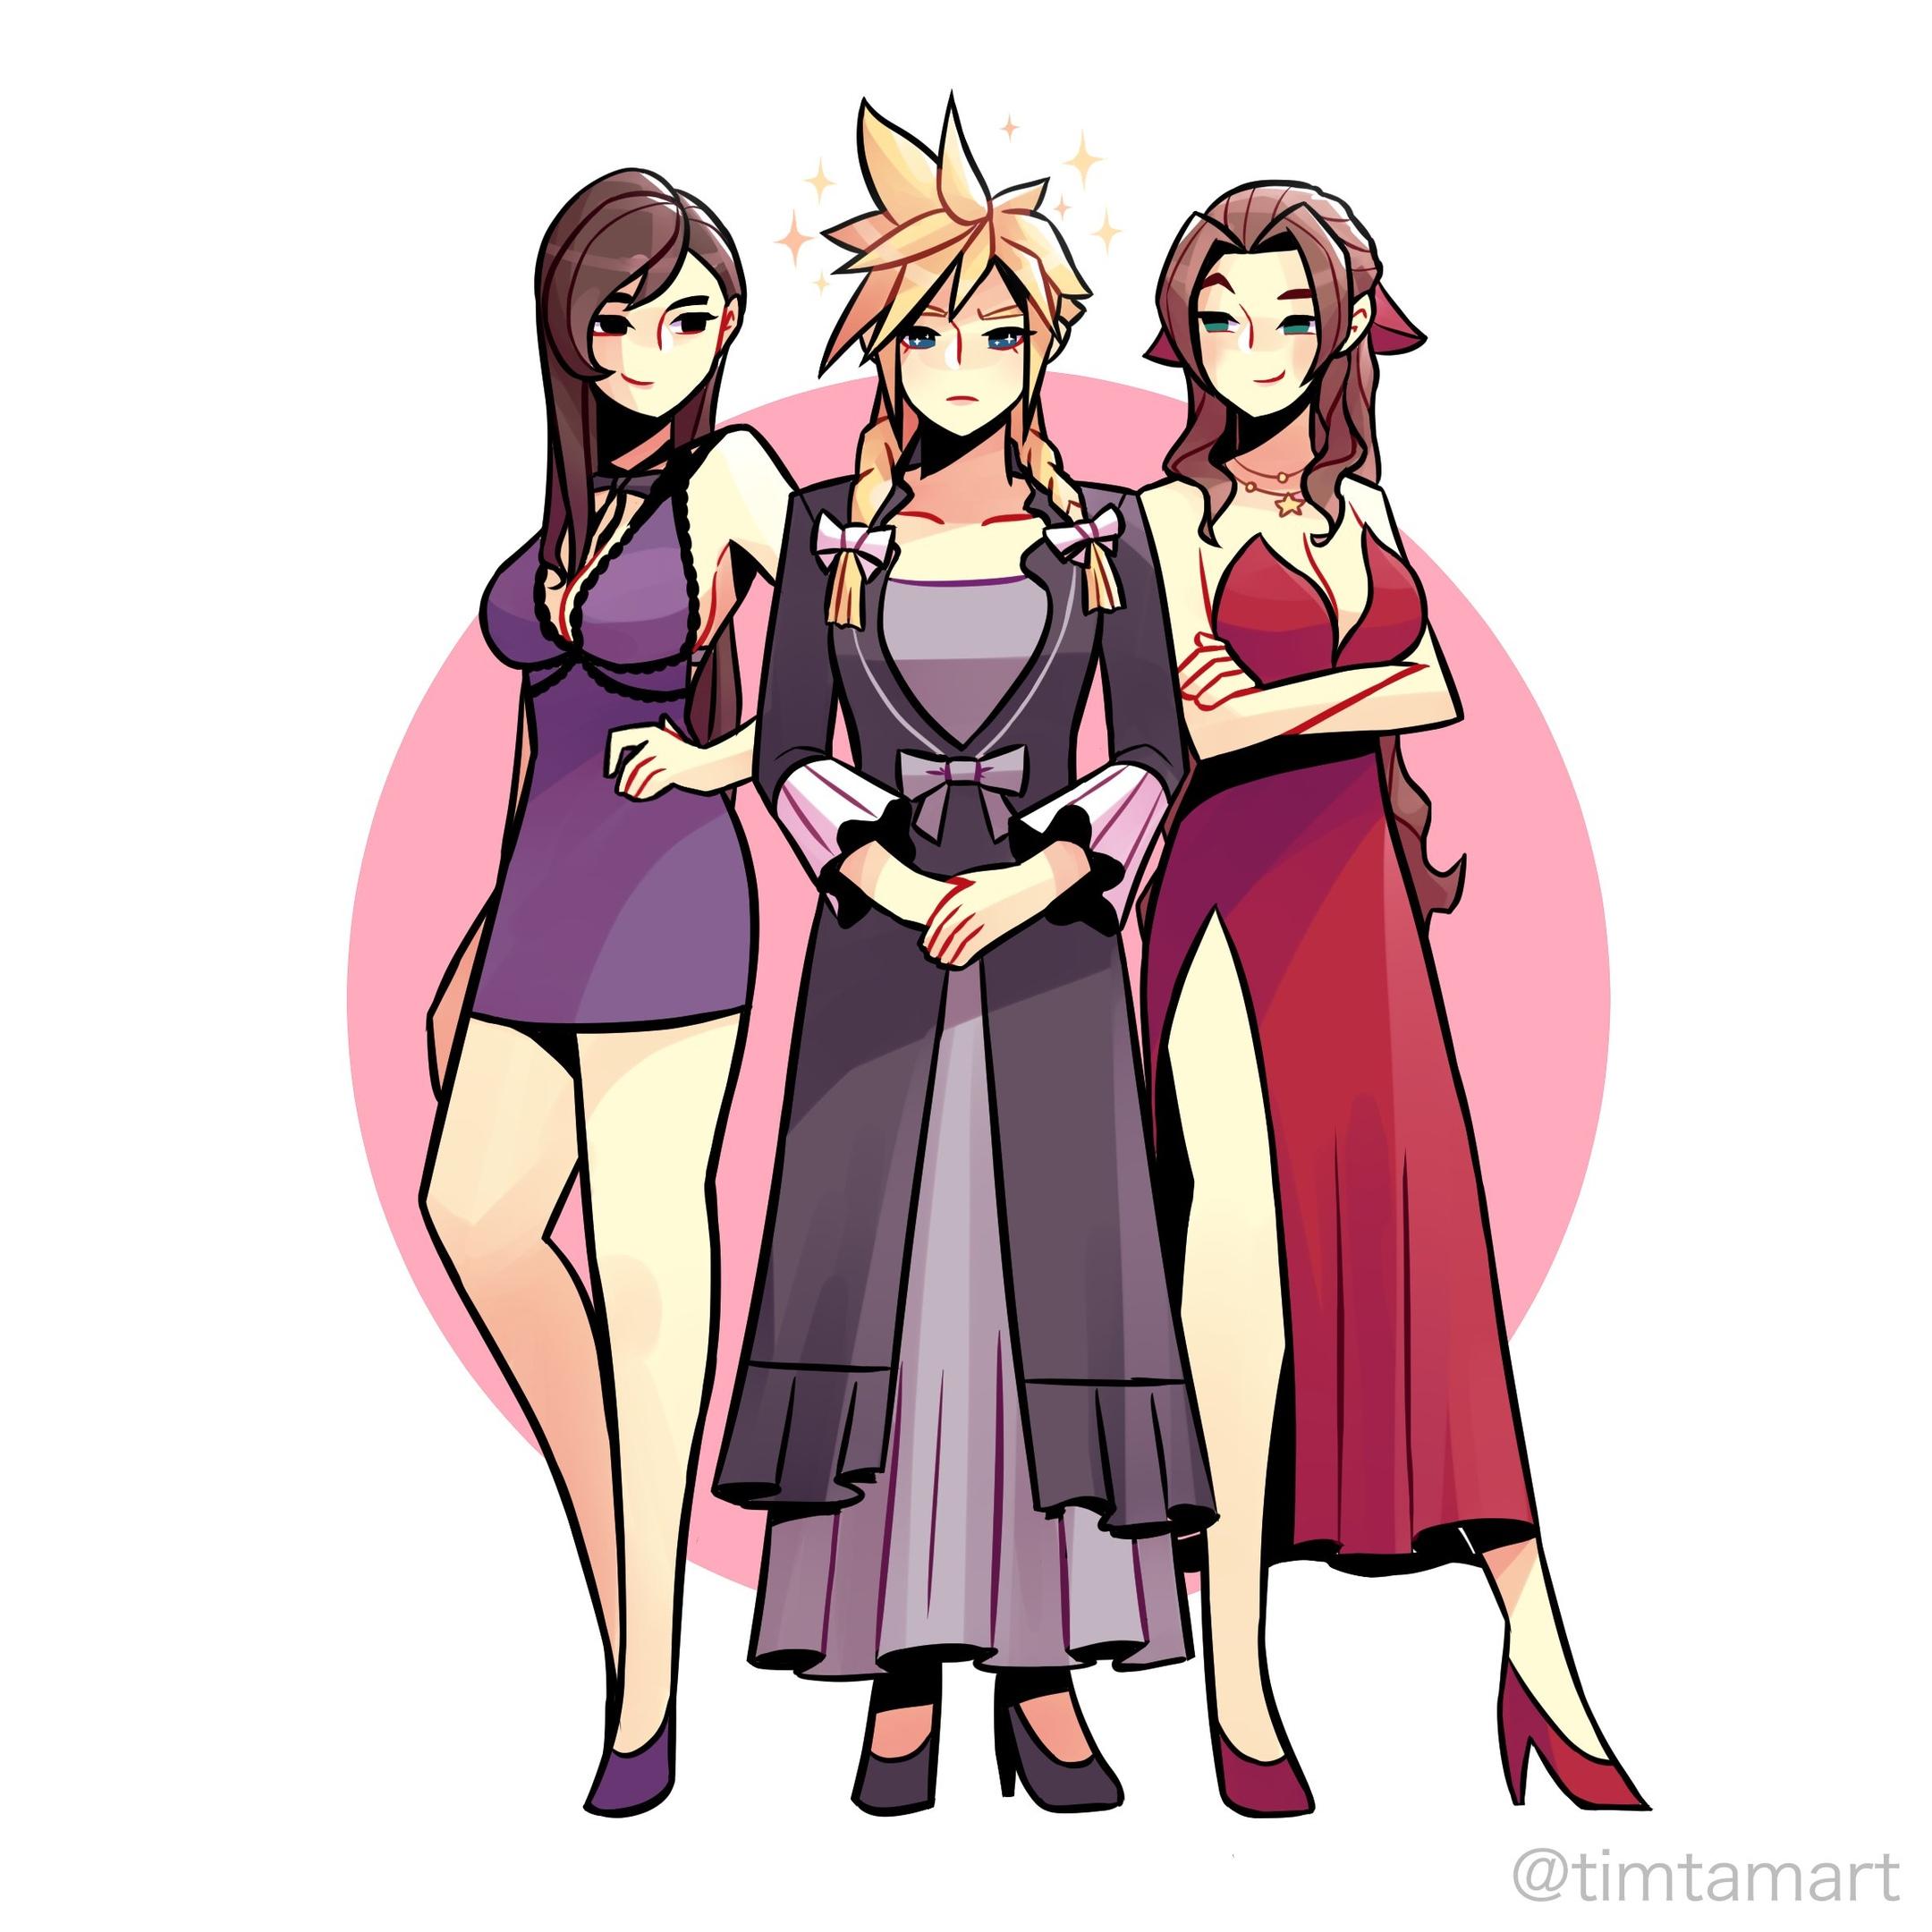 bNOQTy_pM-k.jpg - Final Fantasy 7